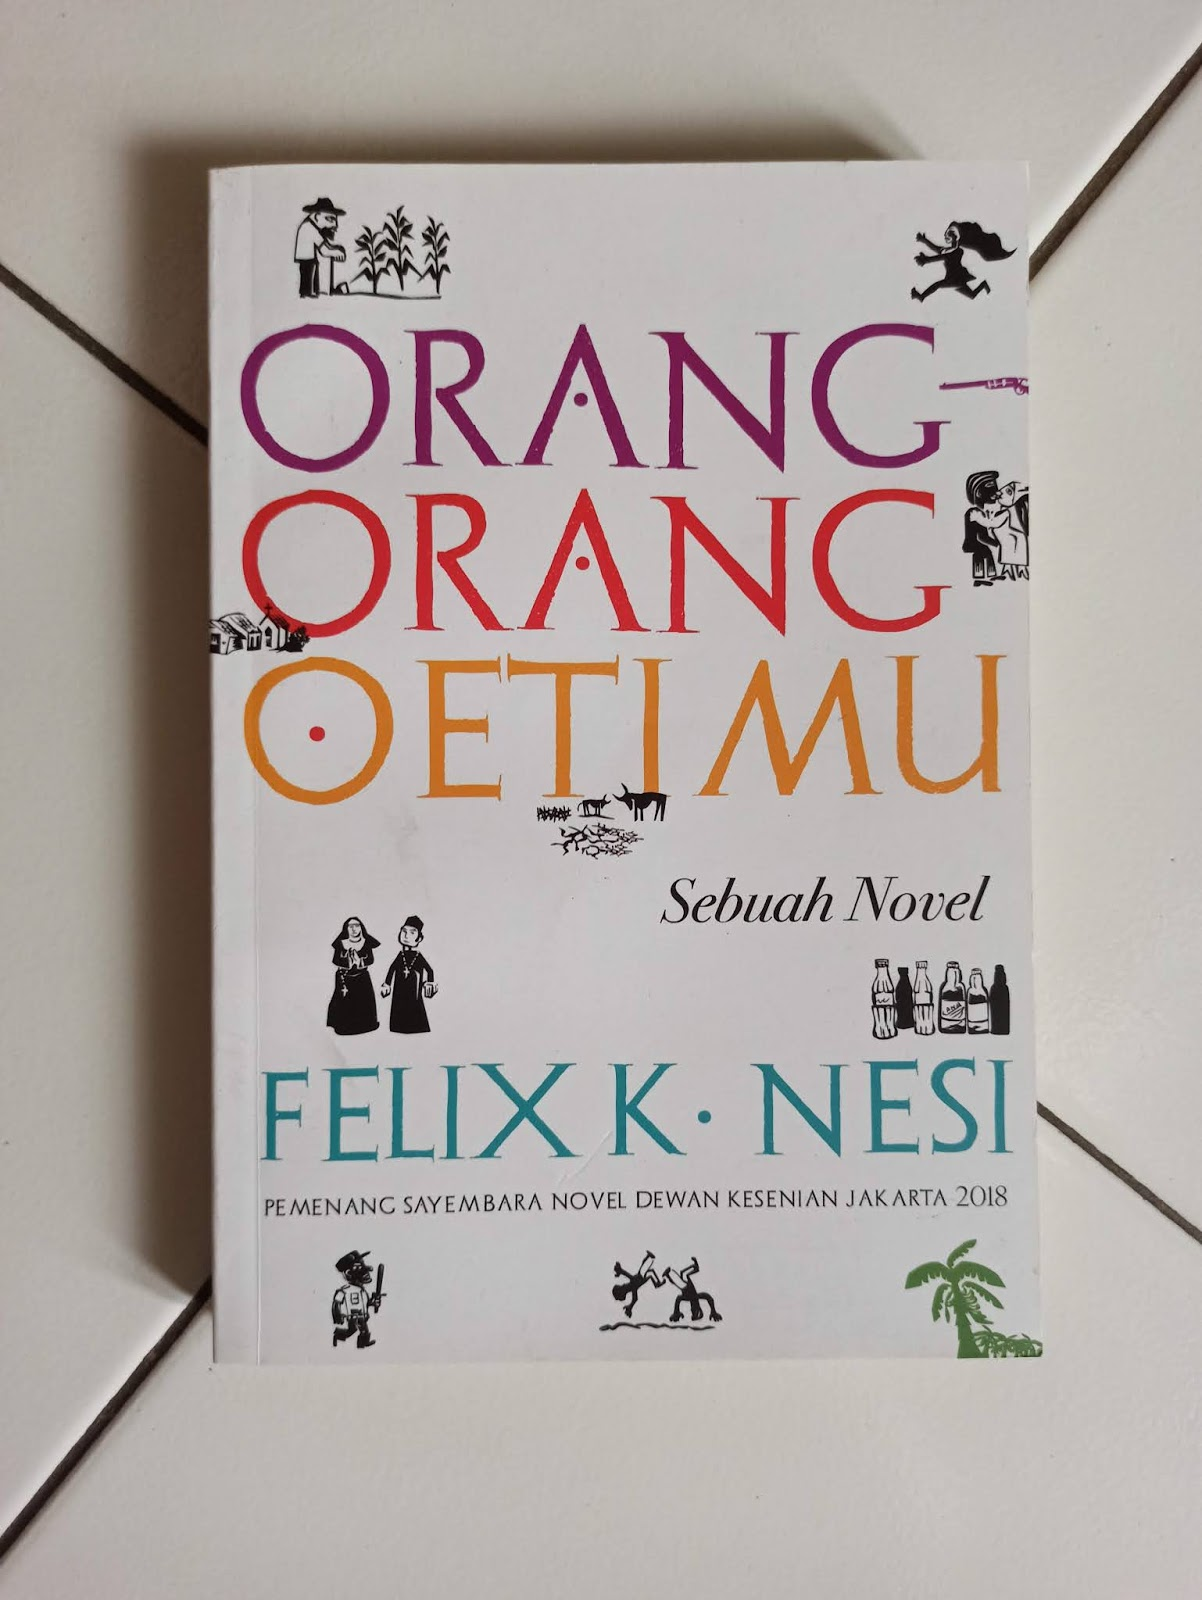 Novel Karya Penulis Felix K. Nesi